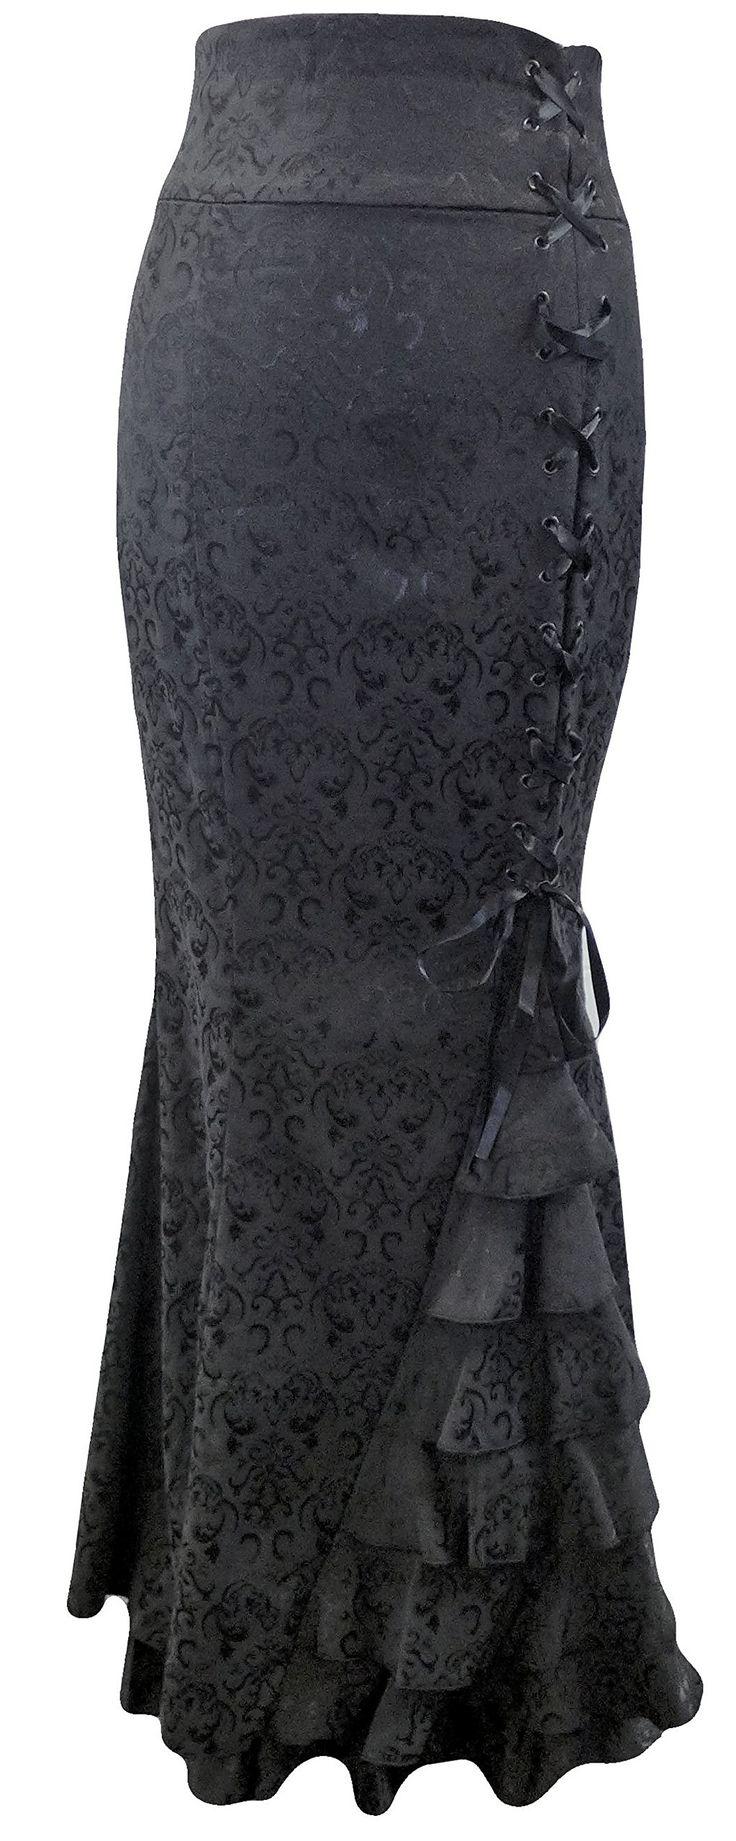 Size 14/16 Black Corset Ruffle Fishtail Brocade Jacquard Larp Gothic Long Morticia Skirt at Amazon Women's Clothing store: